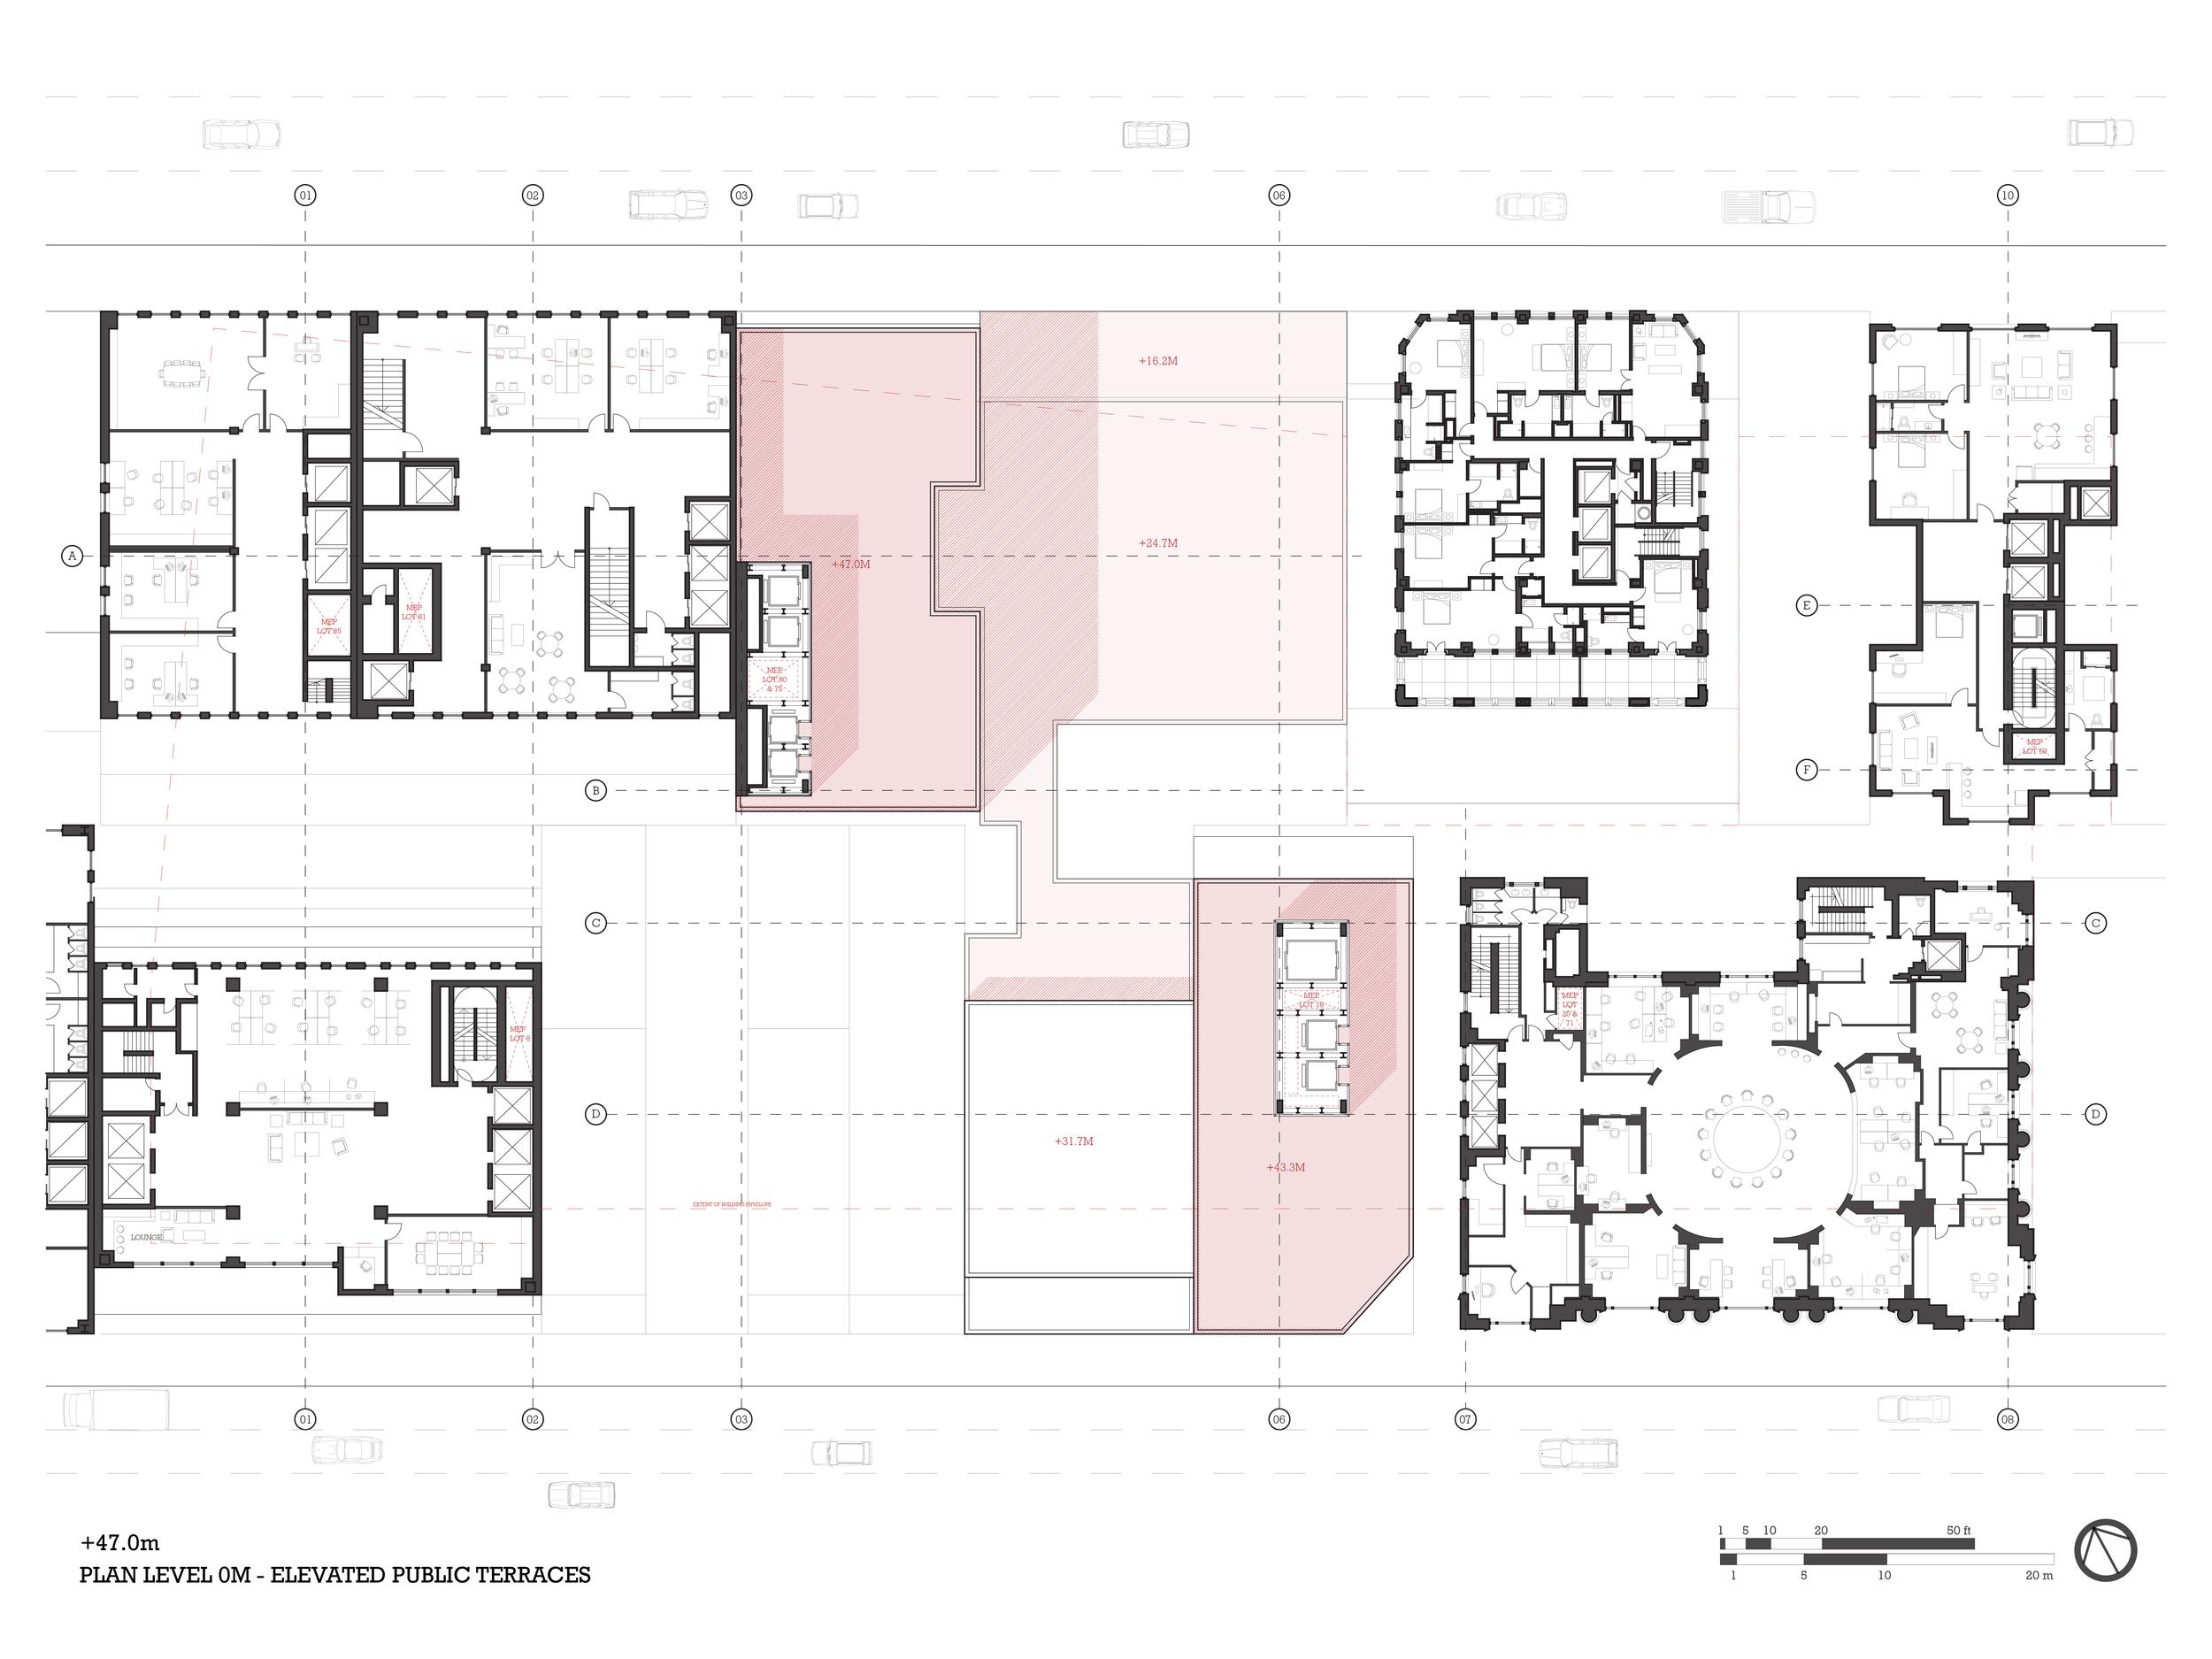 02.5 Plan - 02 Elevated Public Terraces [White].jpg